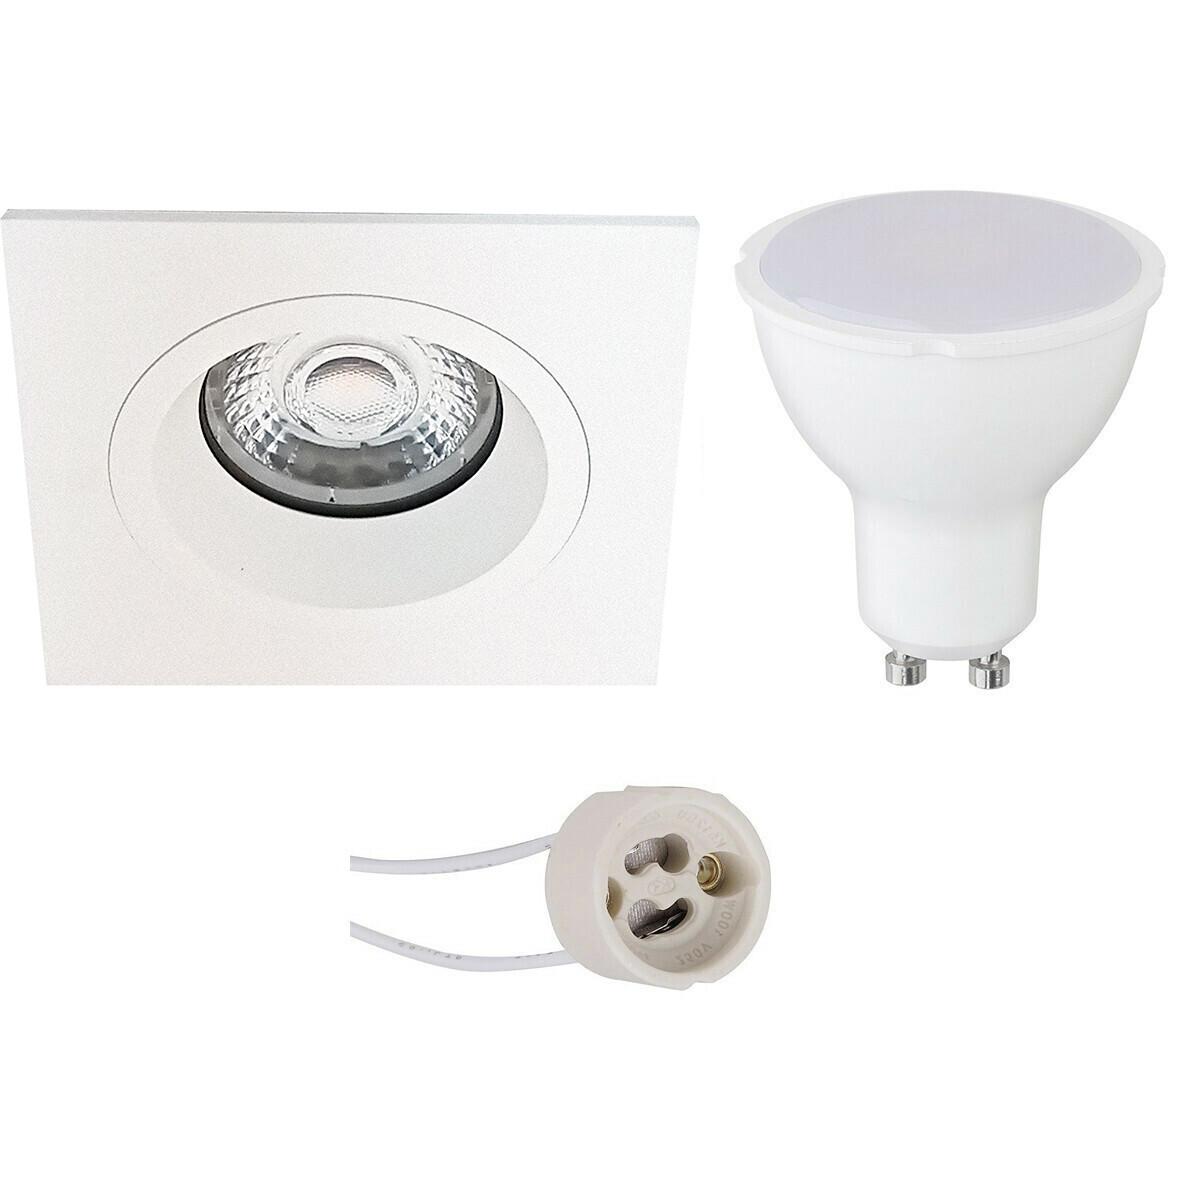 LED Spot Set - Aigi - Pragmi Rodos Pro - GU10 Fitting - Inbouw Vierkant - Mat Wit - 8W - Warm Wit 30